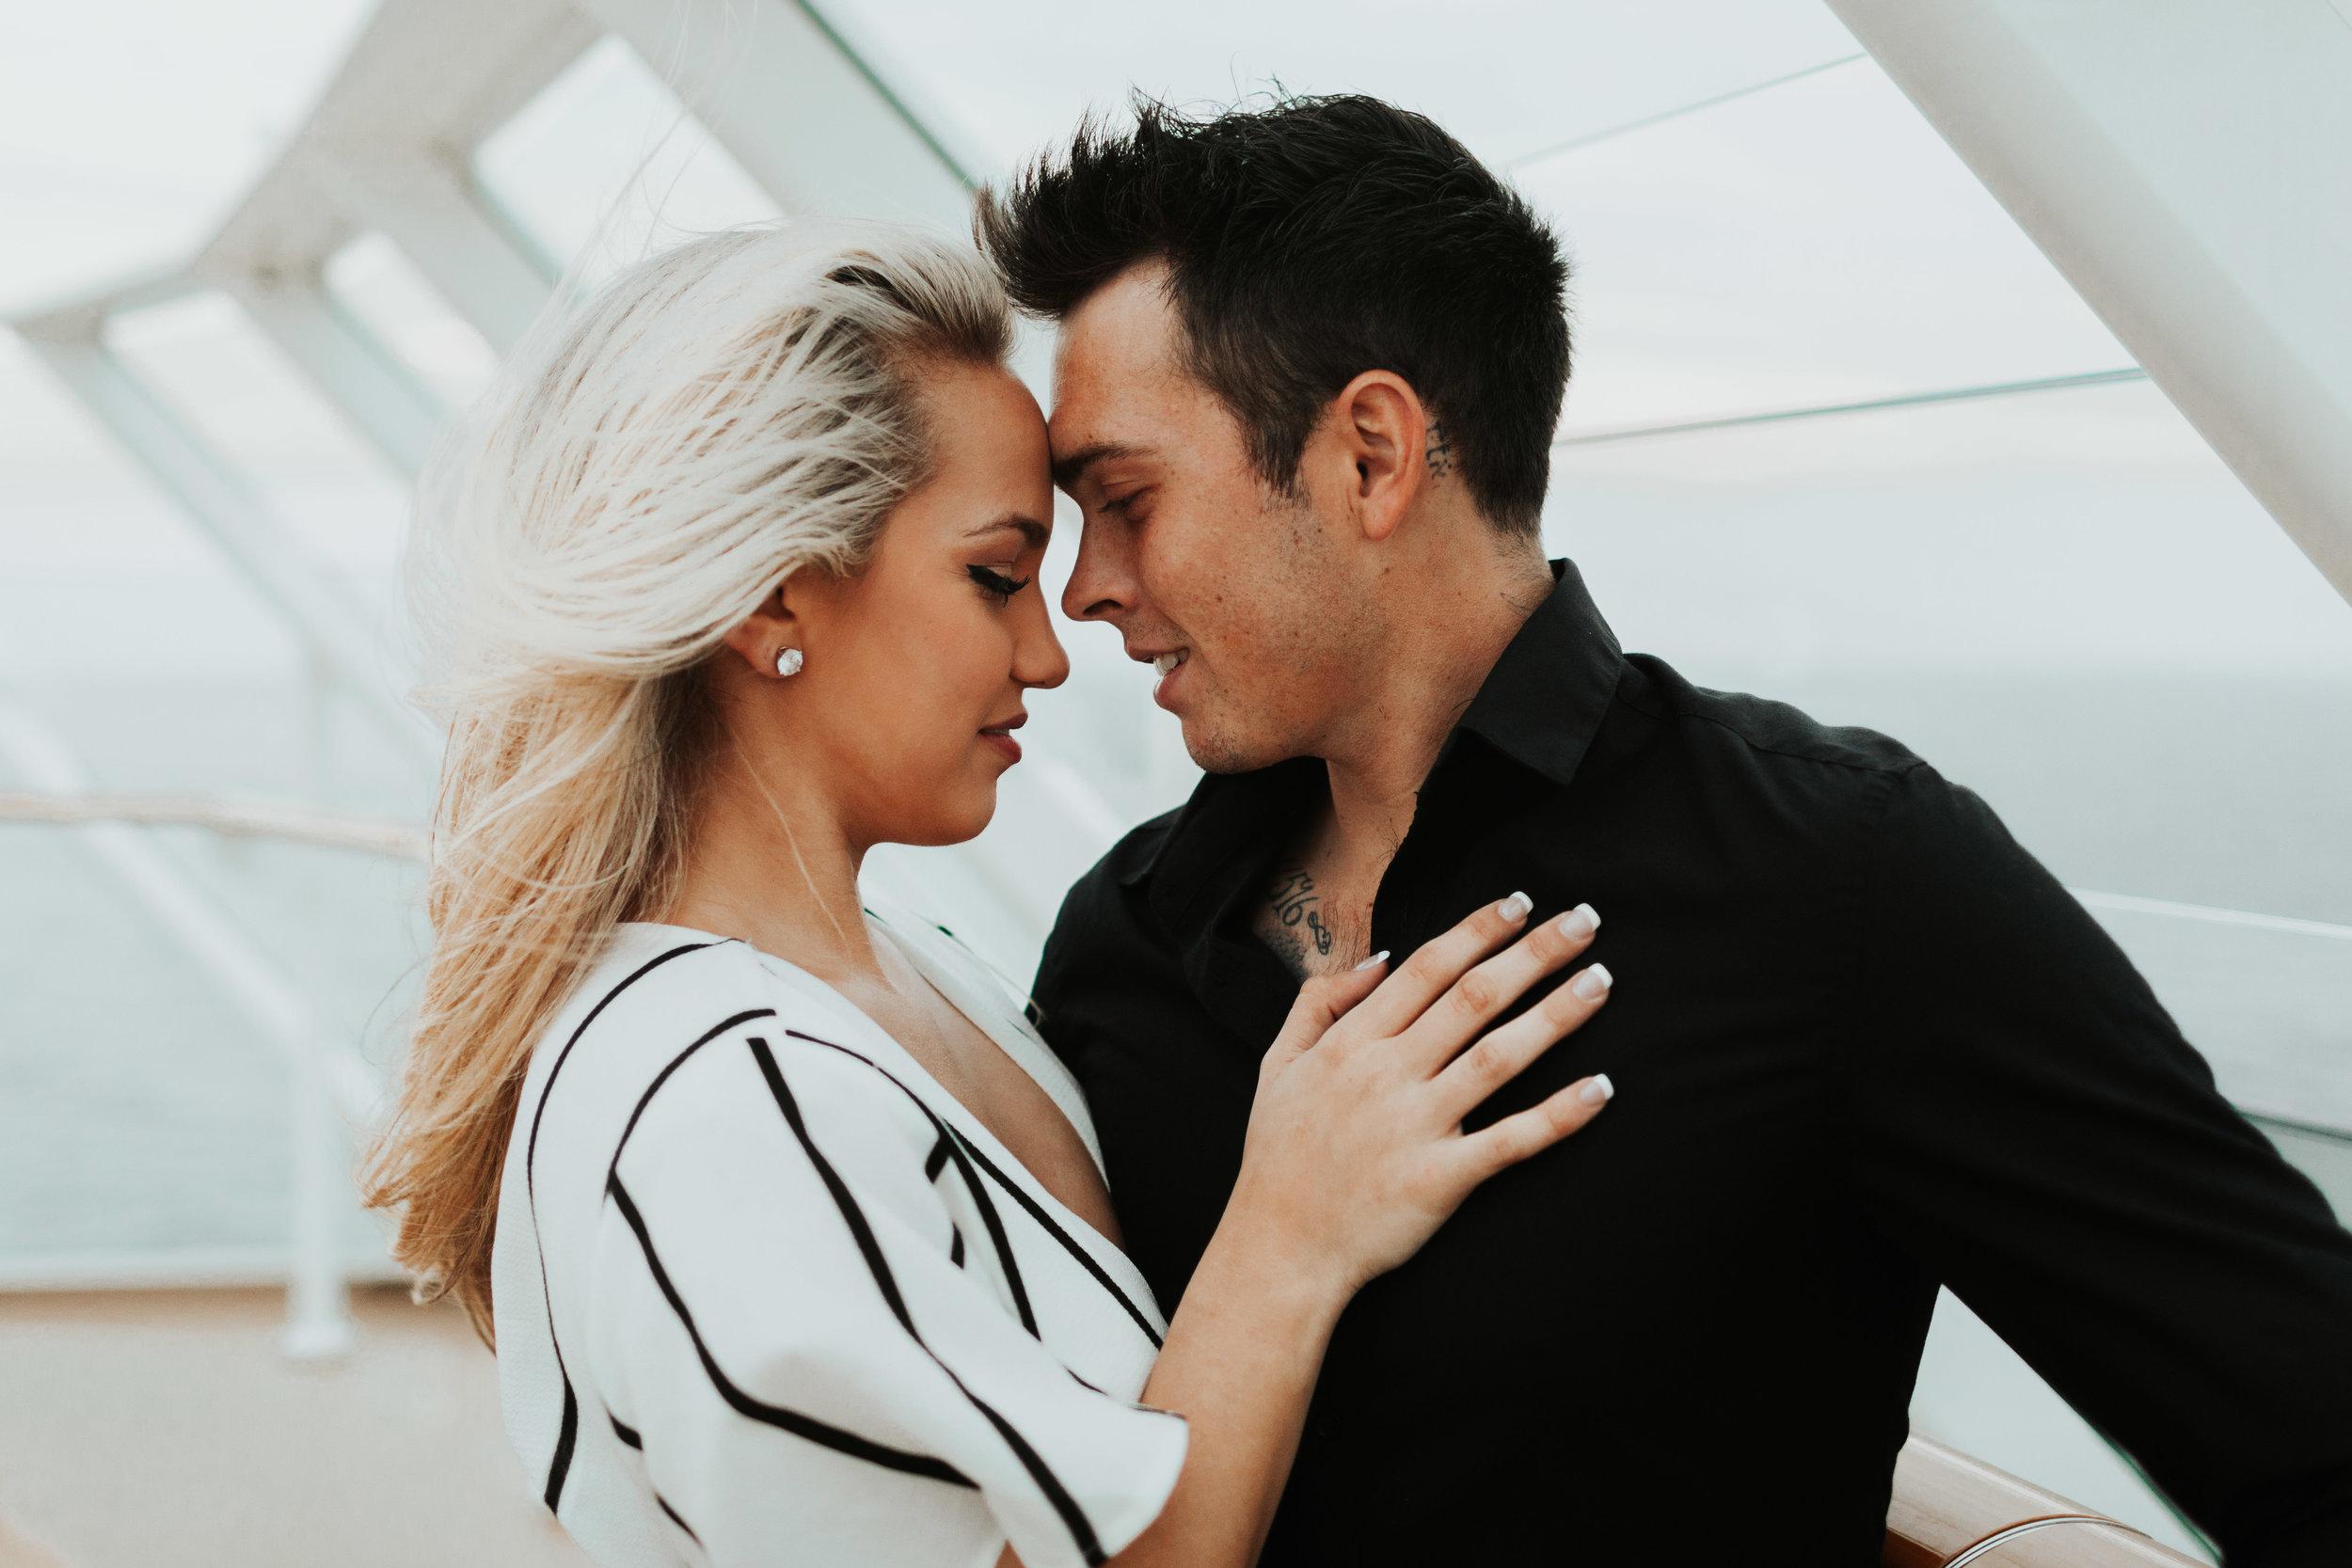 Mason and Rebecca Baltic Sea Cruise engagement photos couple session baltic sea norwegian cruise lines travel destination photographer windy